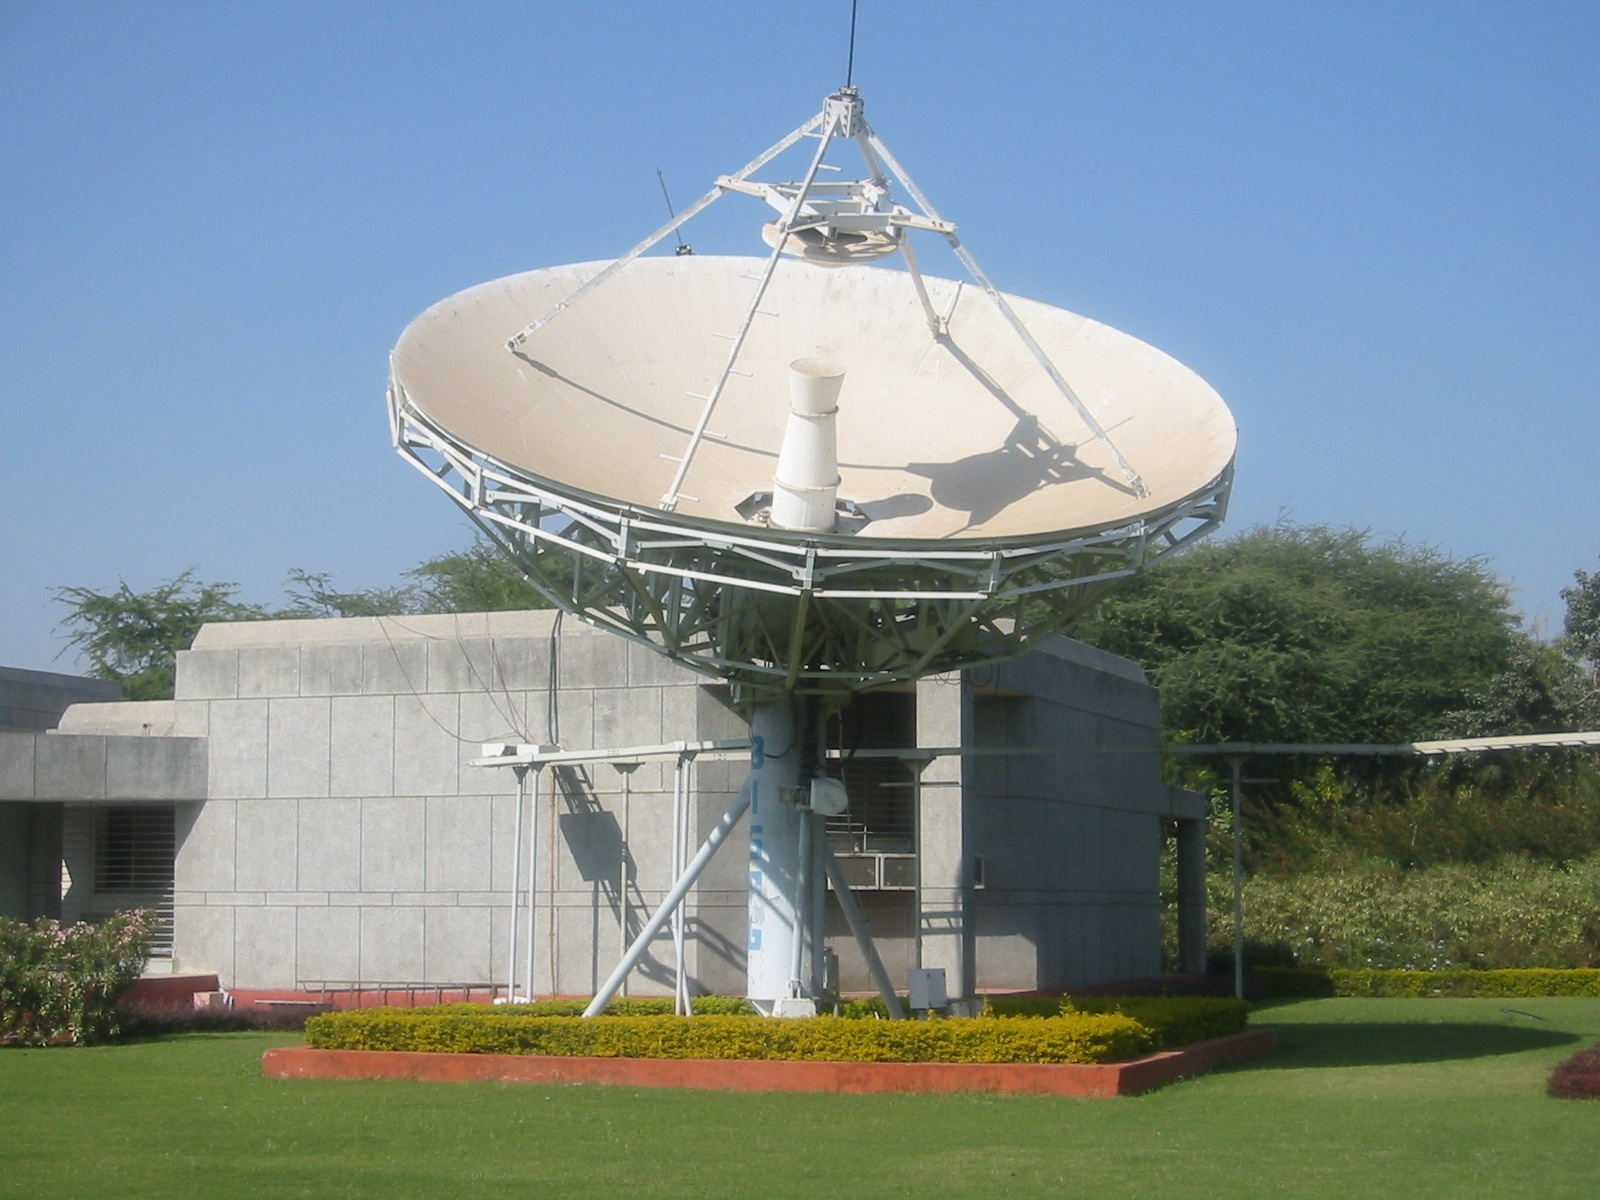 file satellite antenna wikimedia commons. Black Bedroom Furniture Sets. Home Design Ideas